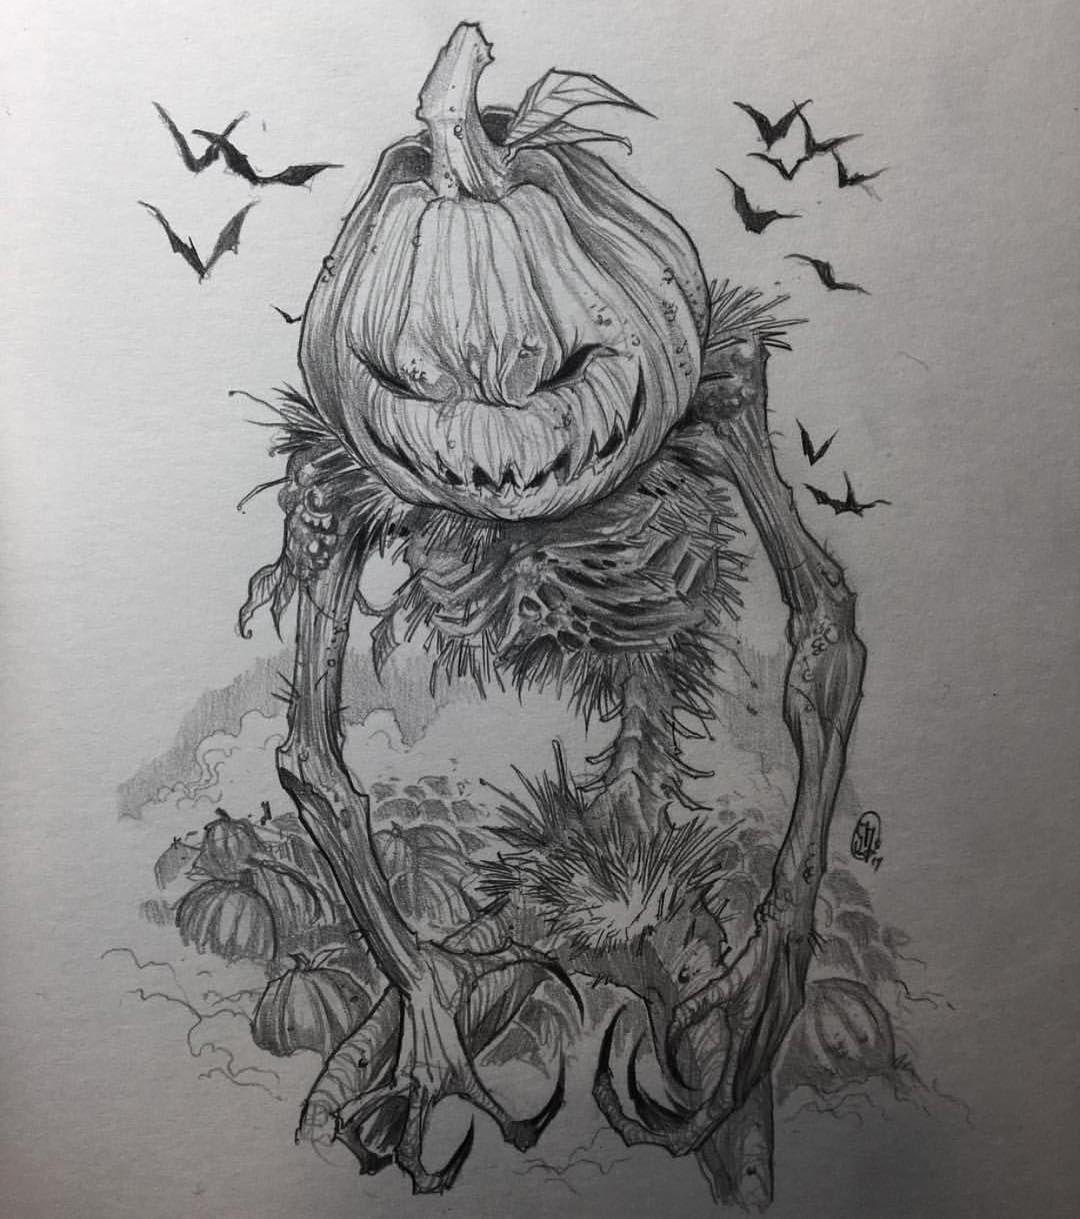 The Great Pumpkin By necromogarip _ arts_help Art